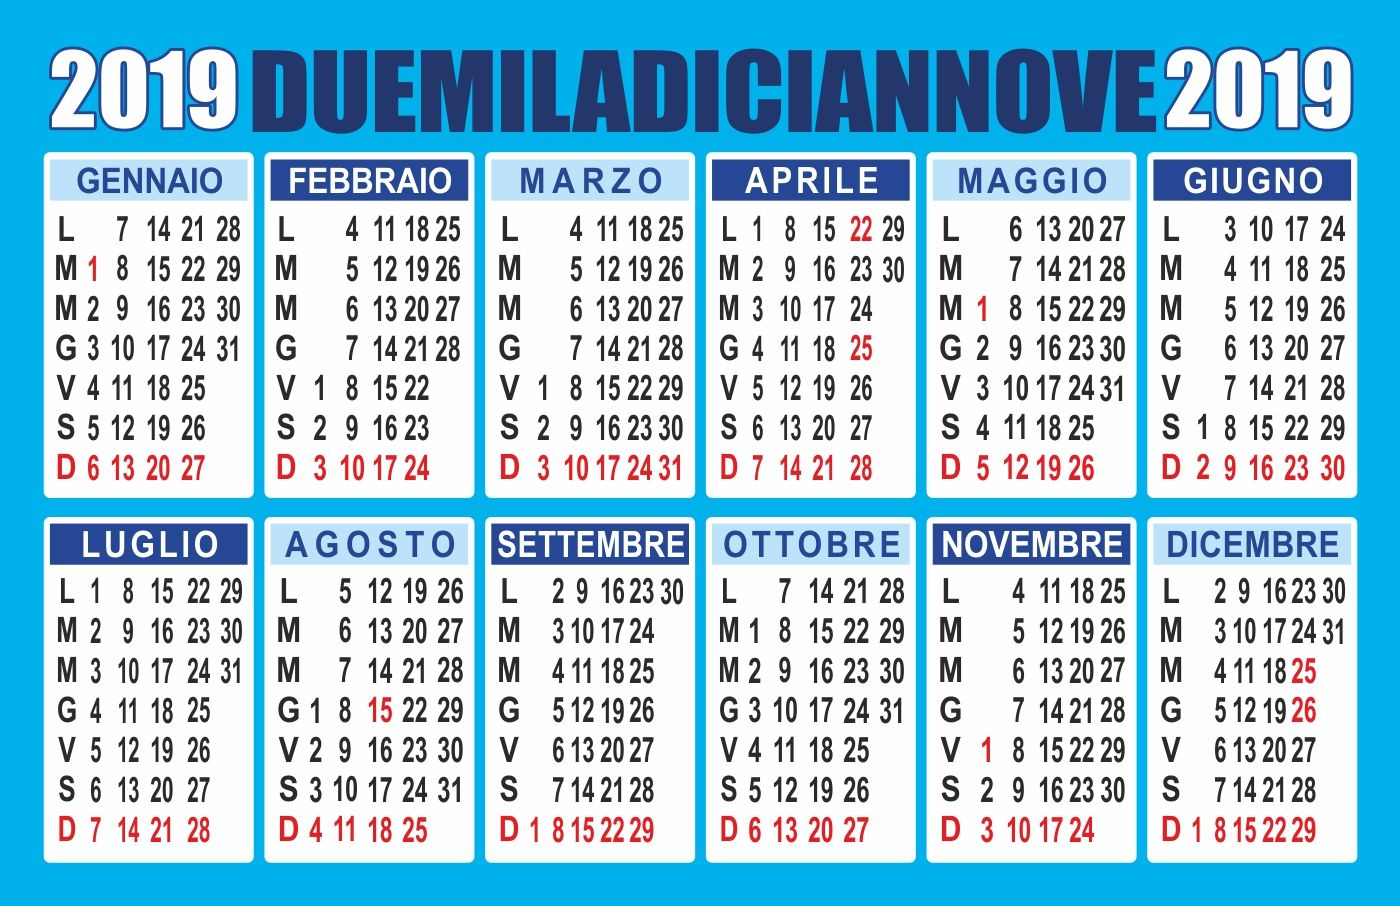 Calendario Con Festivita 2019.Calendario 2019 Pdf Lo Trovi Su Peppecau Com Calendario